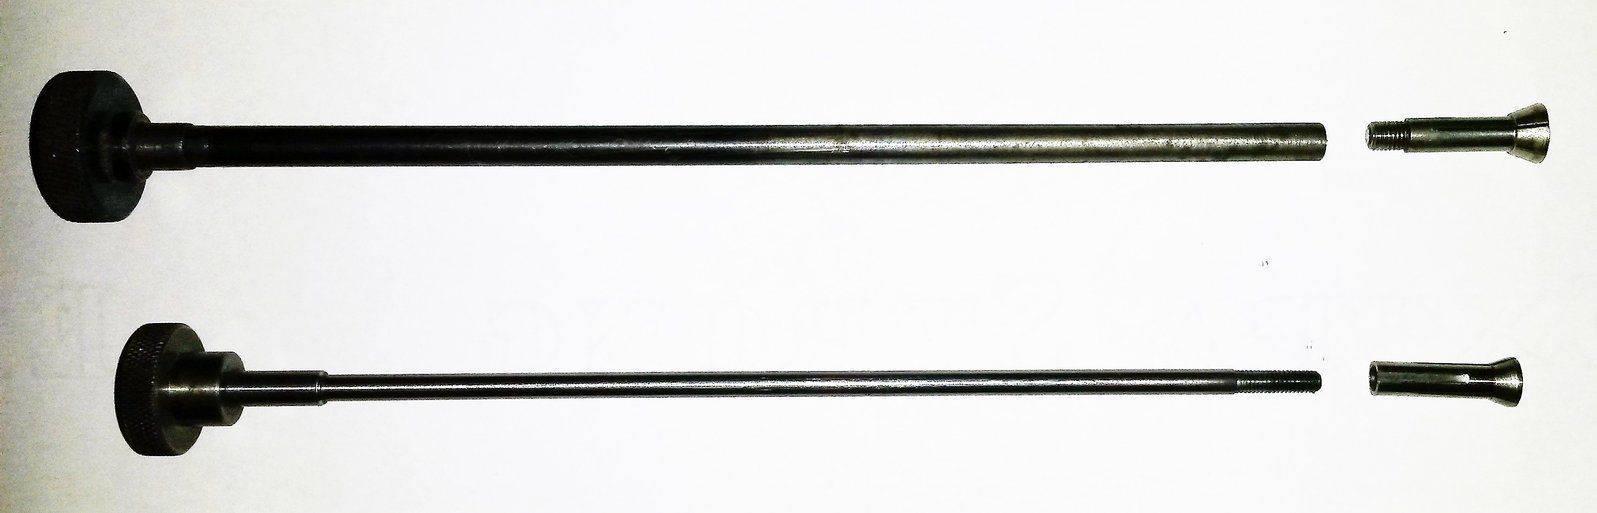 Tirants perceuses B6 et P6-4.jpg